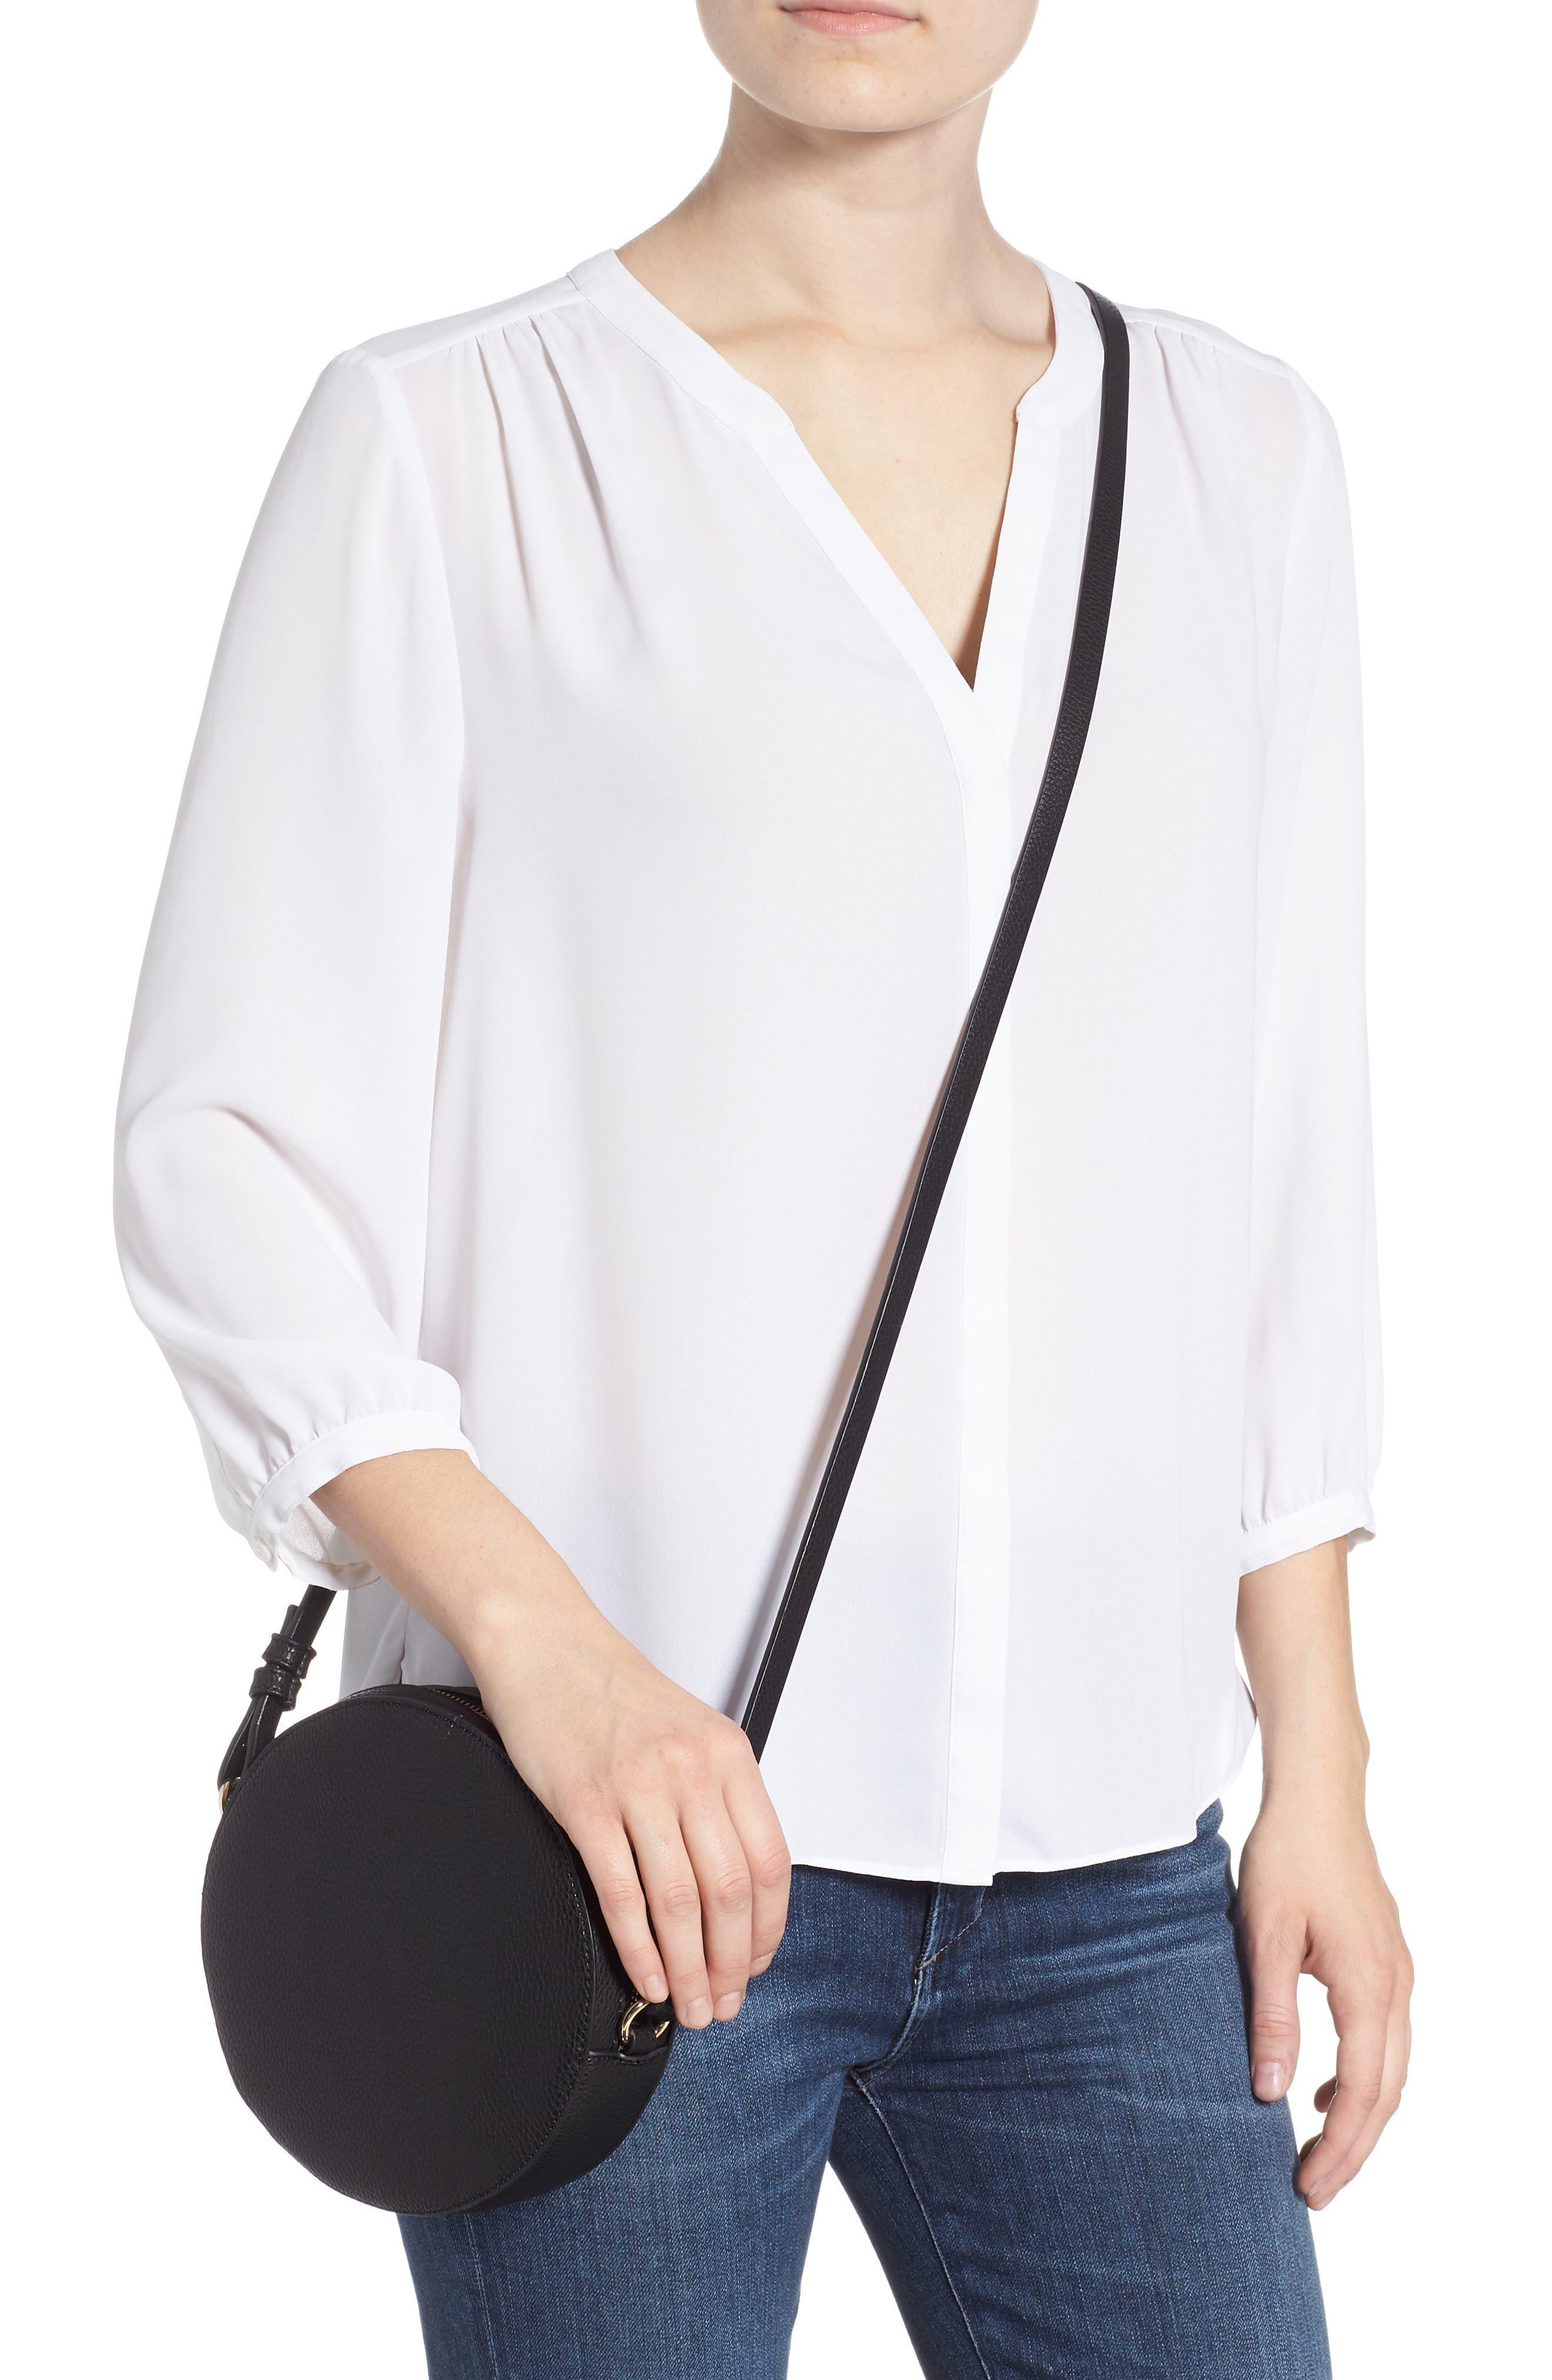 Cassie Faux Leather Circle Crossbody Bag,                             Alternate thumbnail 2, color,                             Black